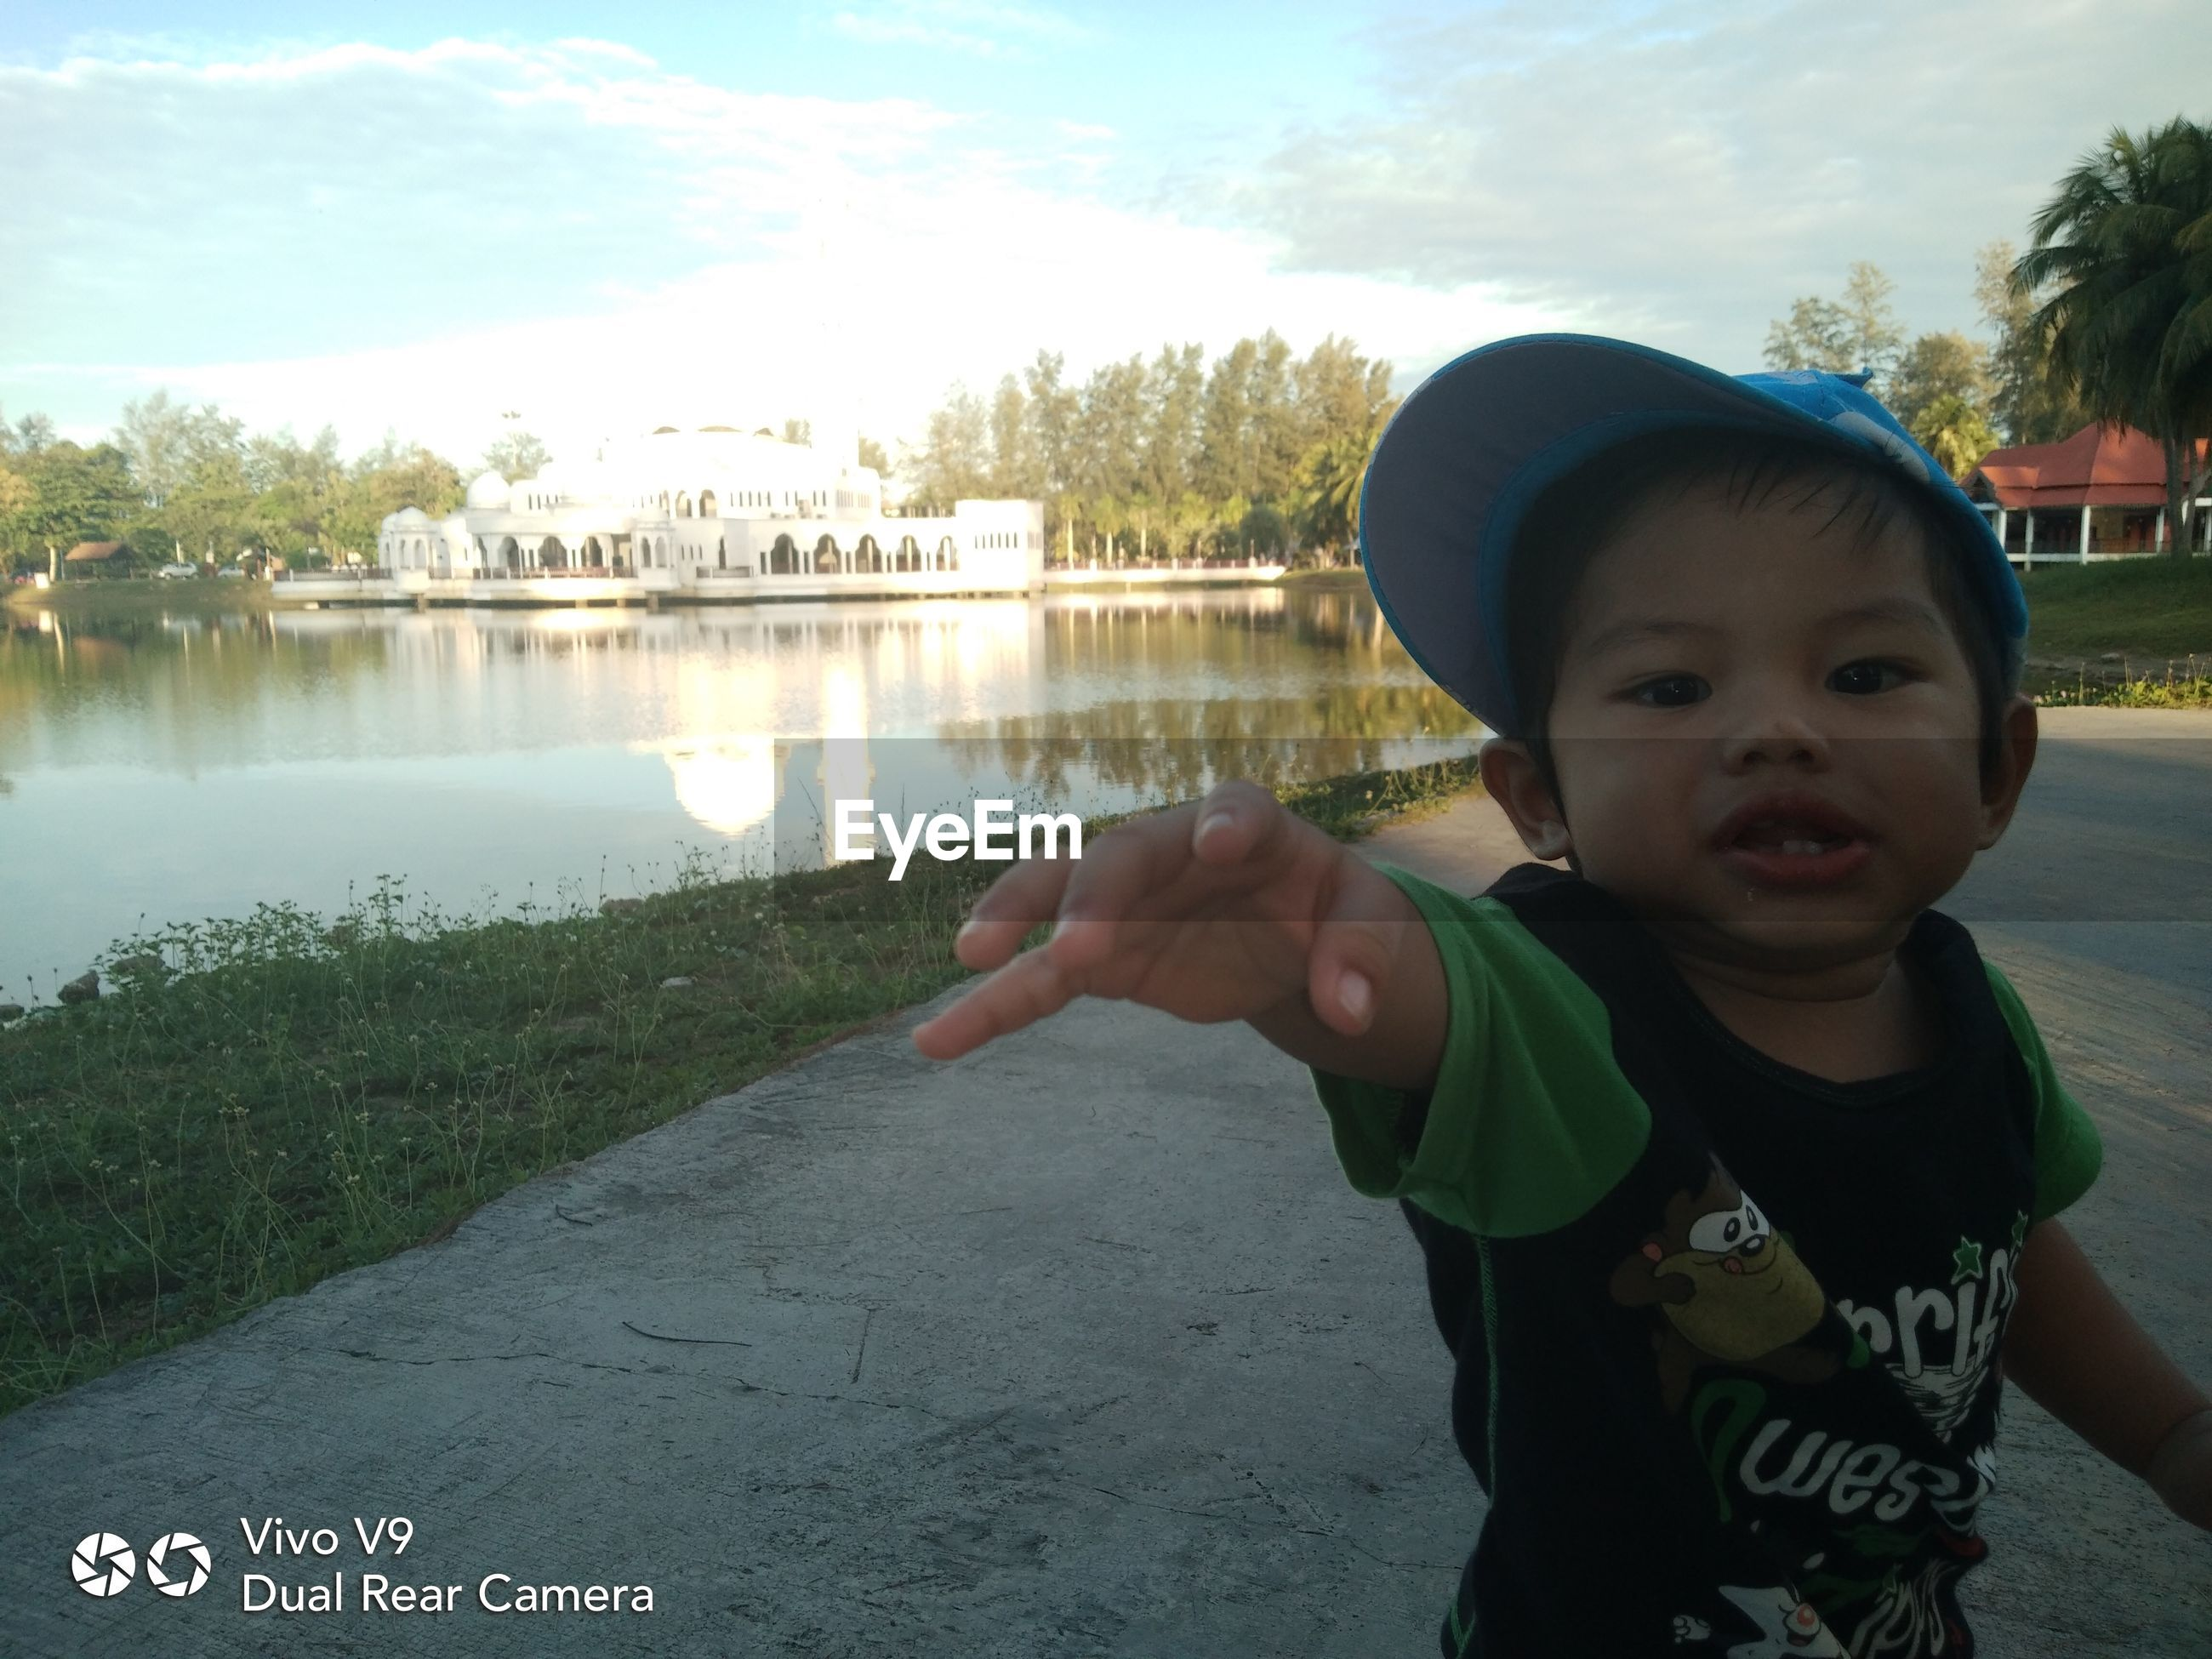 PORTRAIT OF BOY STANDING ON LAKE